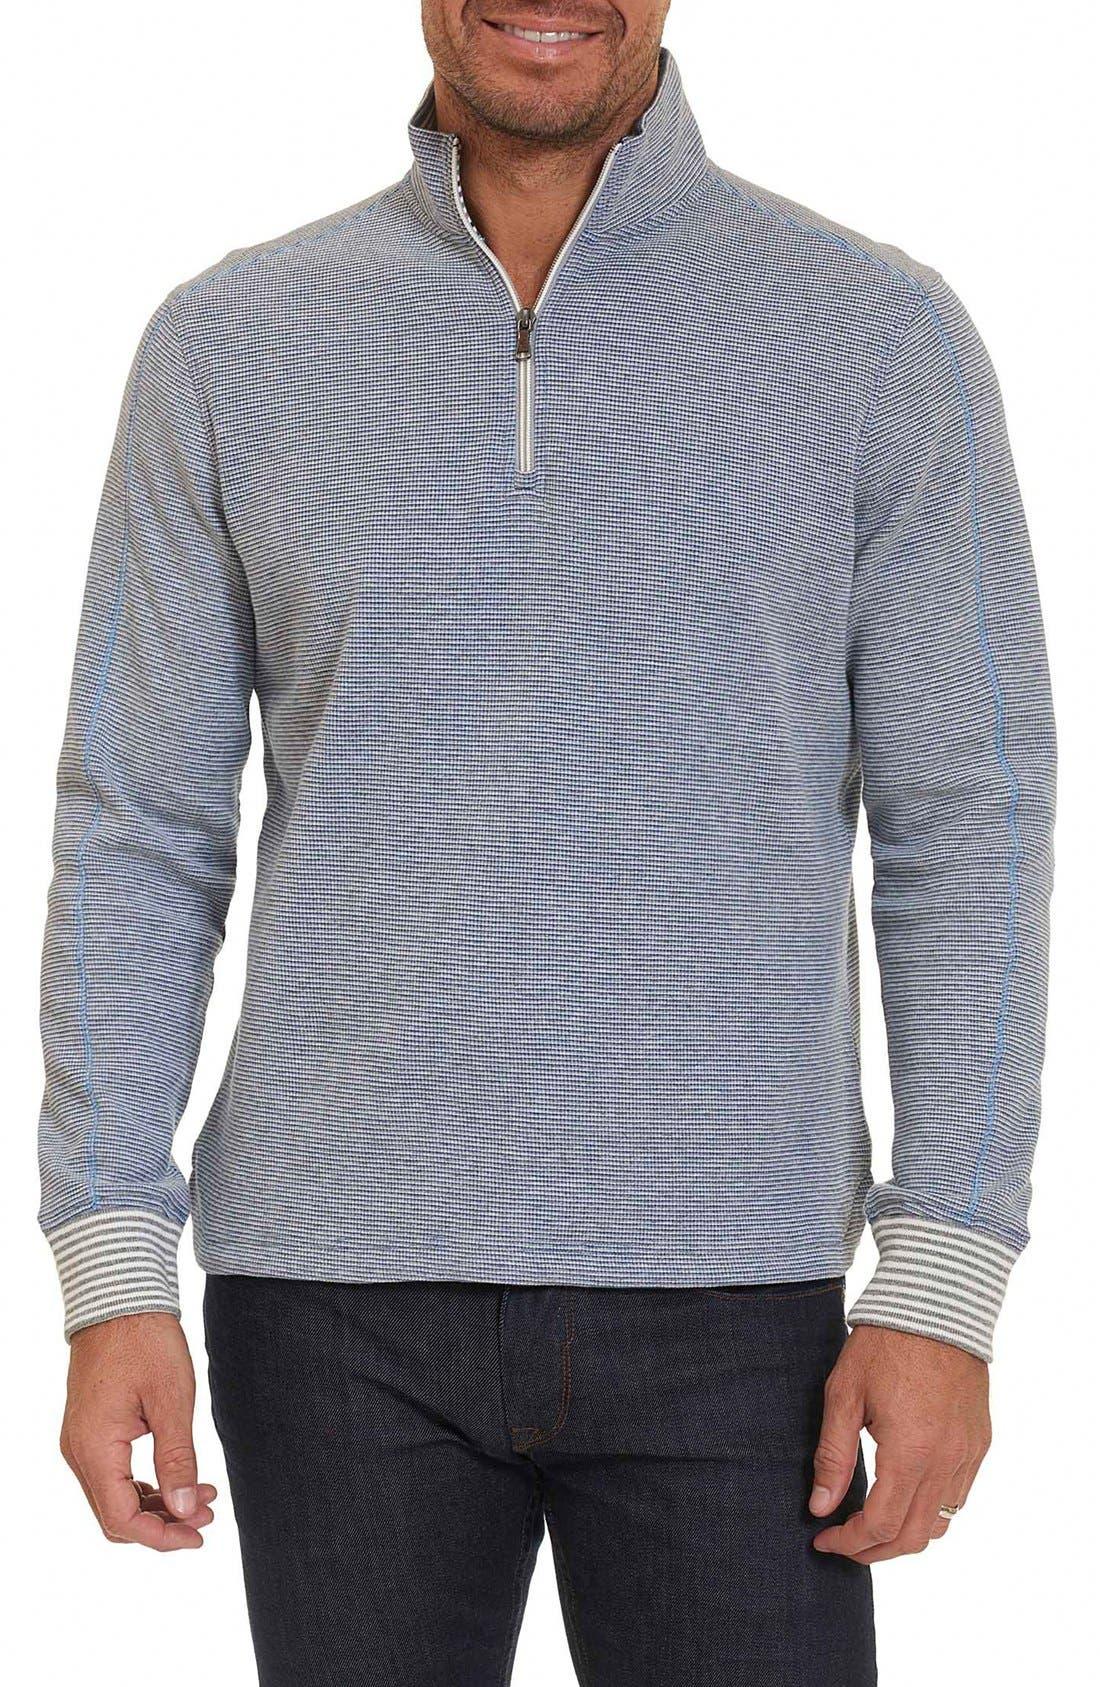 Poole Regular Fit Quarter Zip Pullover,                         Main,                         color, 020